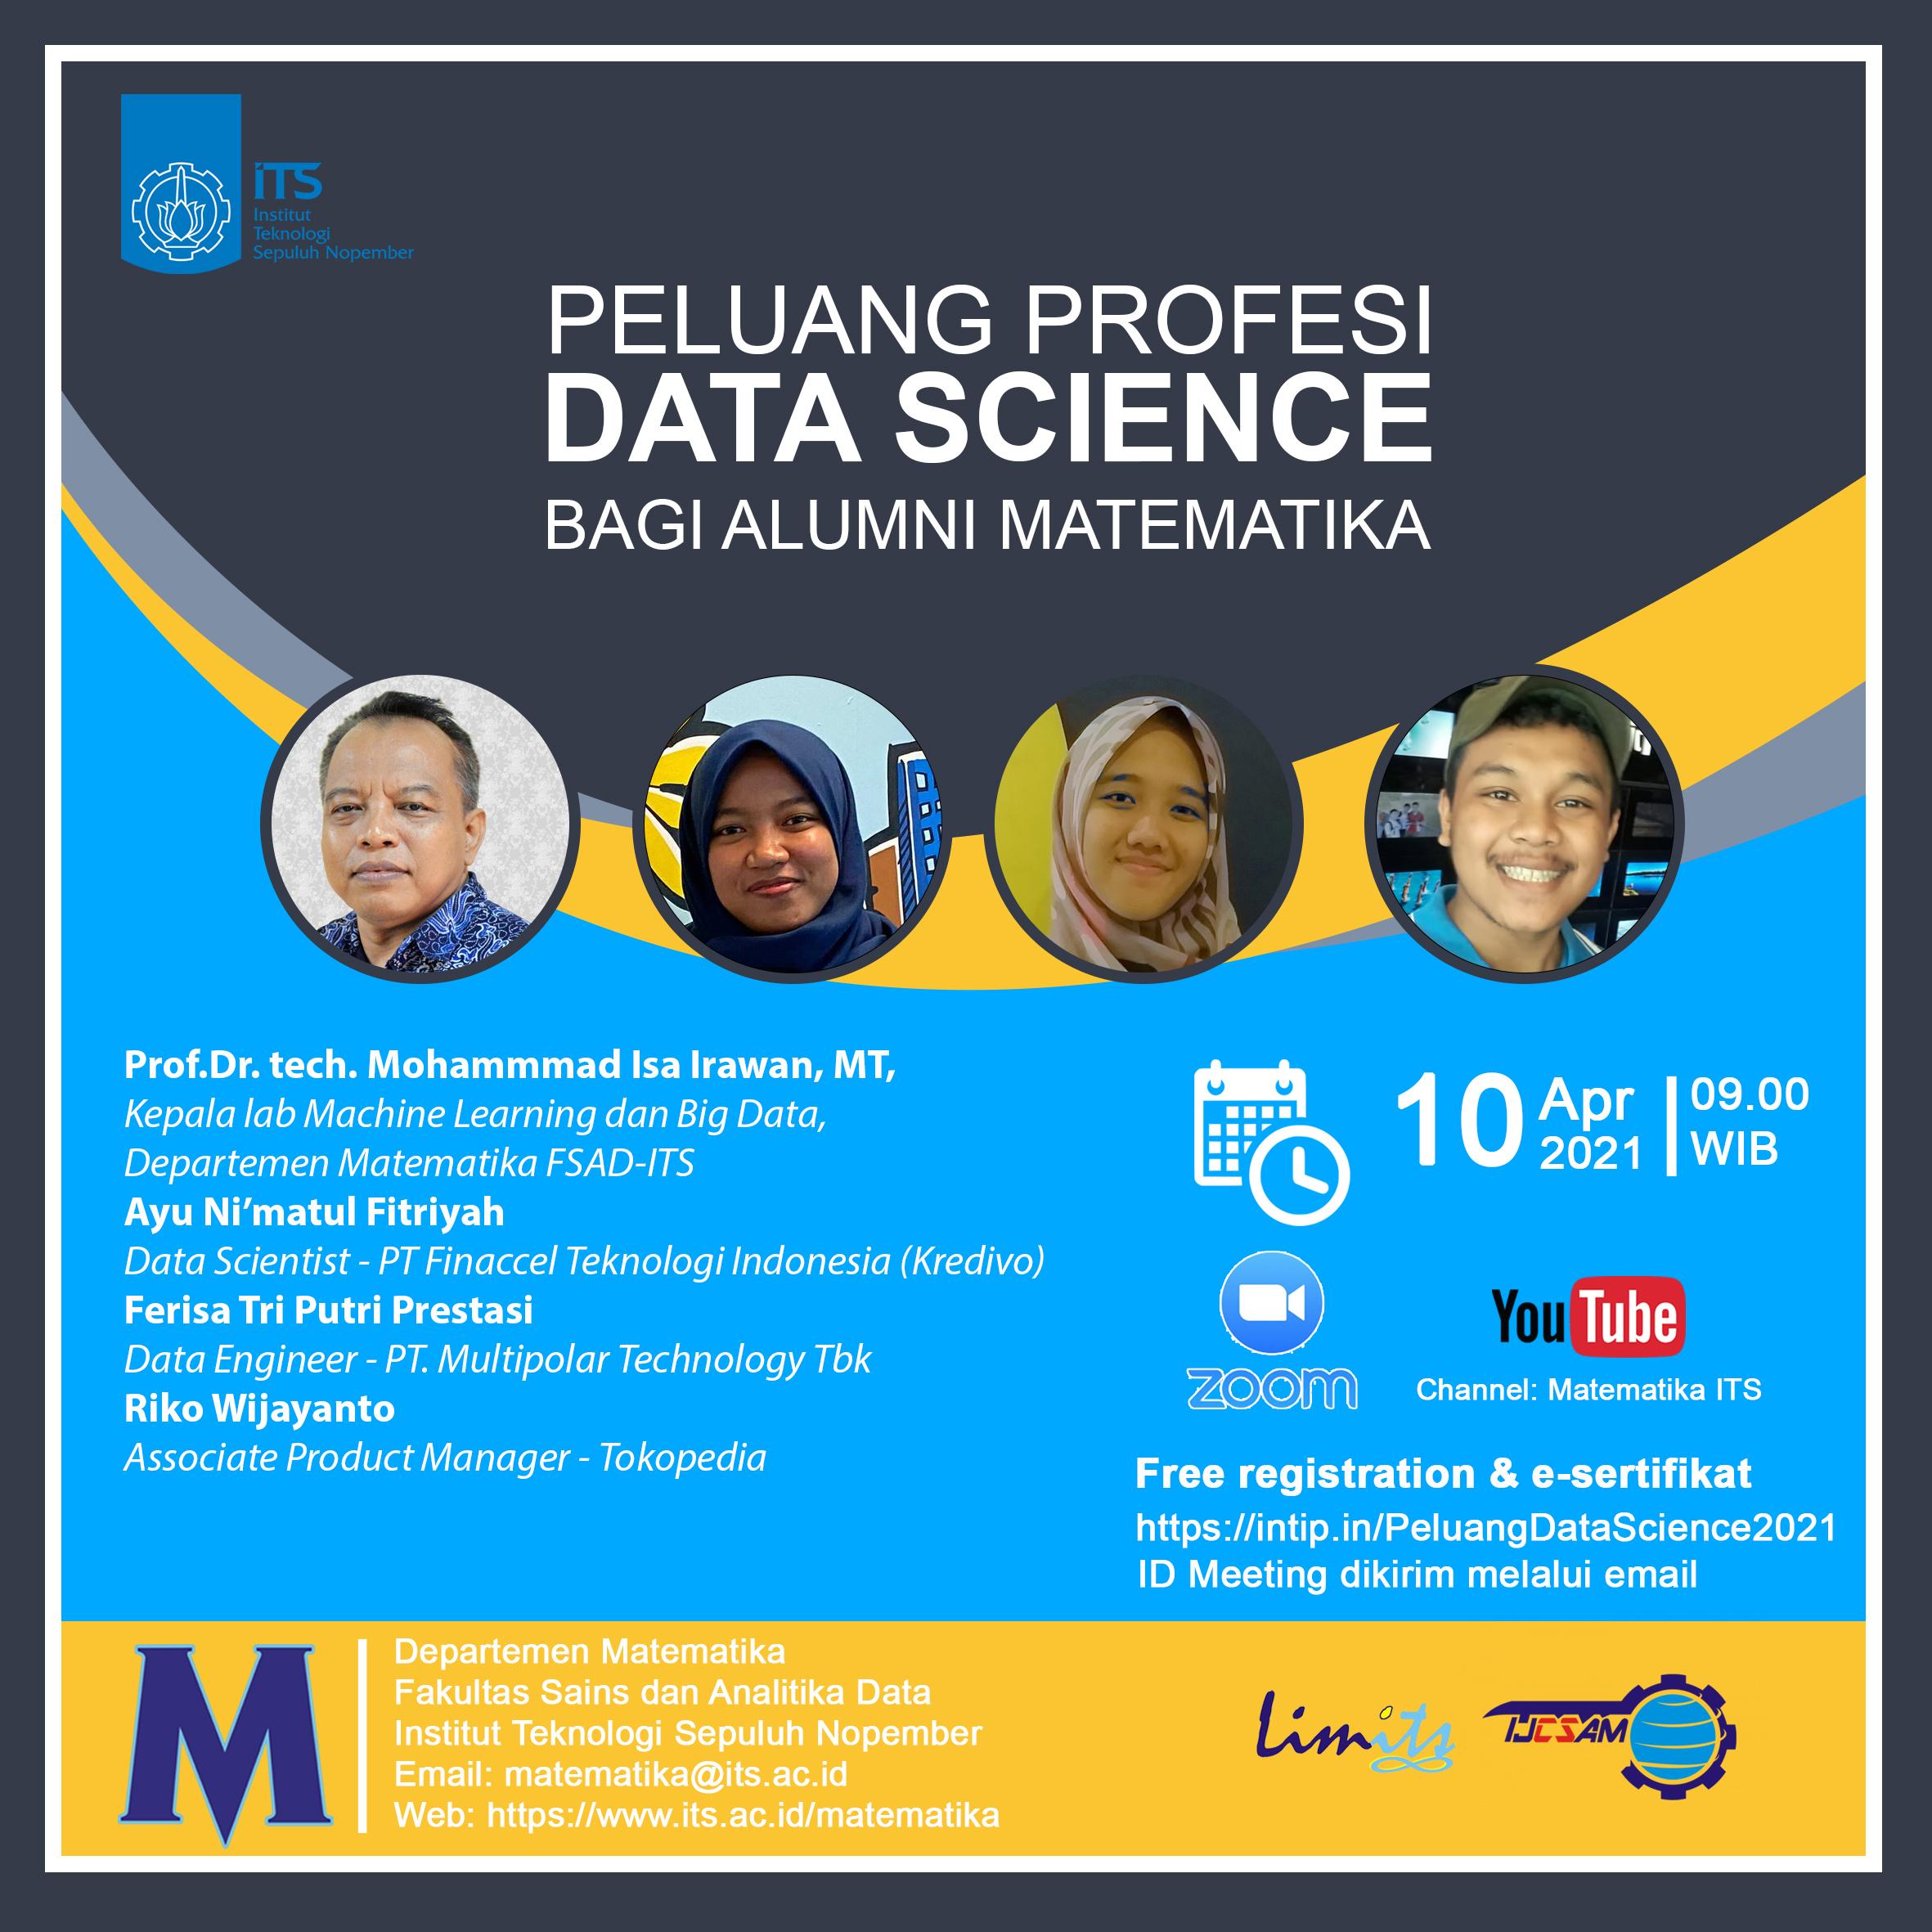 PELUANG PROFESI DATA SCIENCE BAGI ALUMNI MATEMATIKA